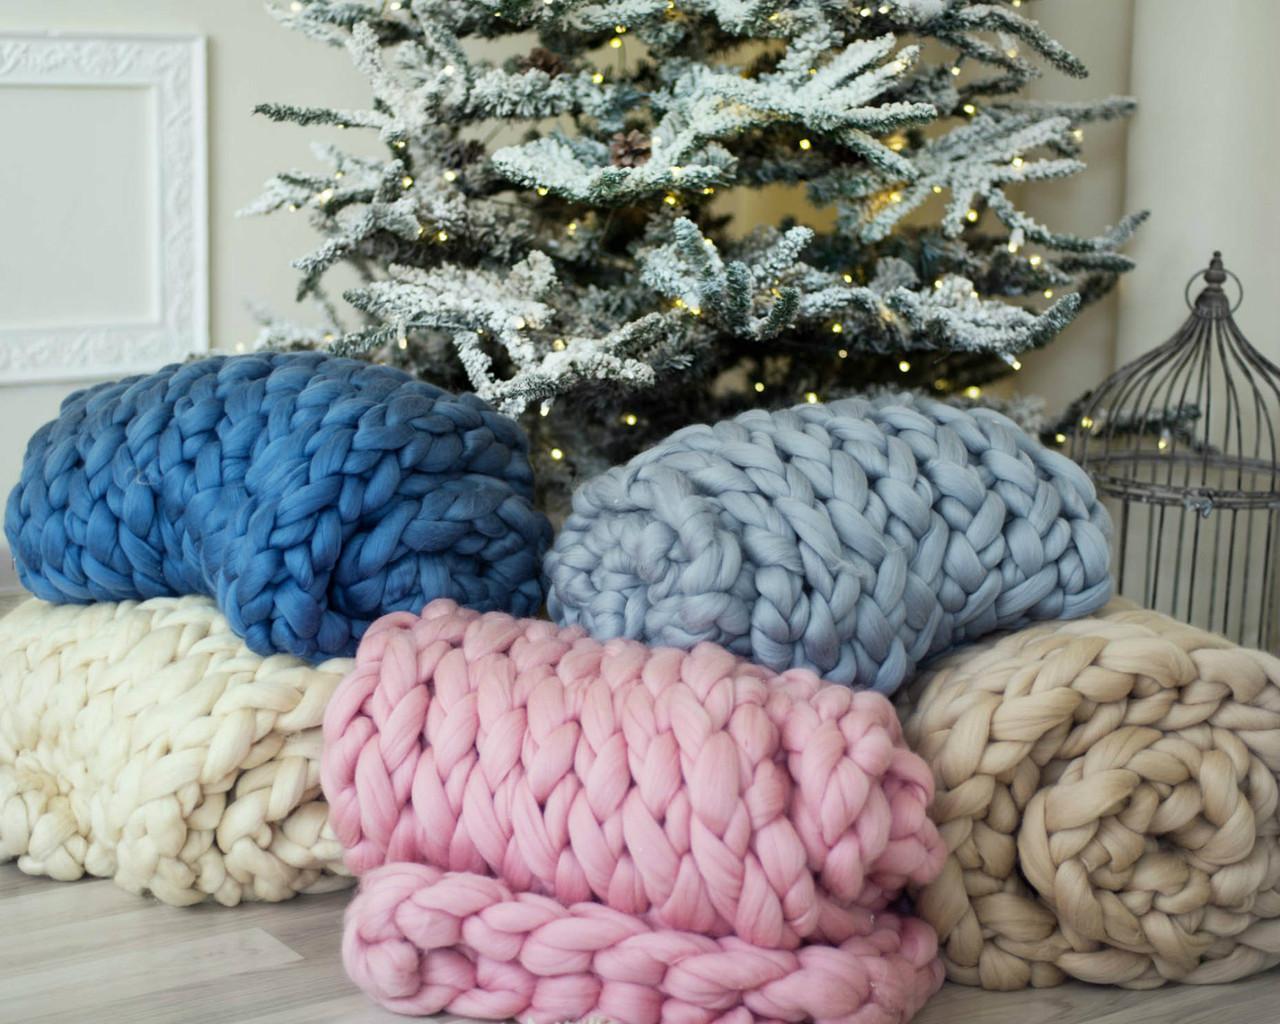 Chunky knit craft ideas